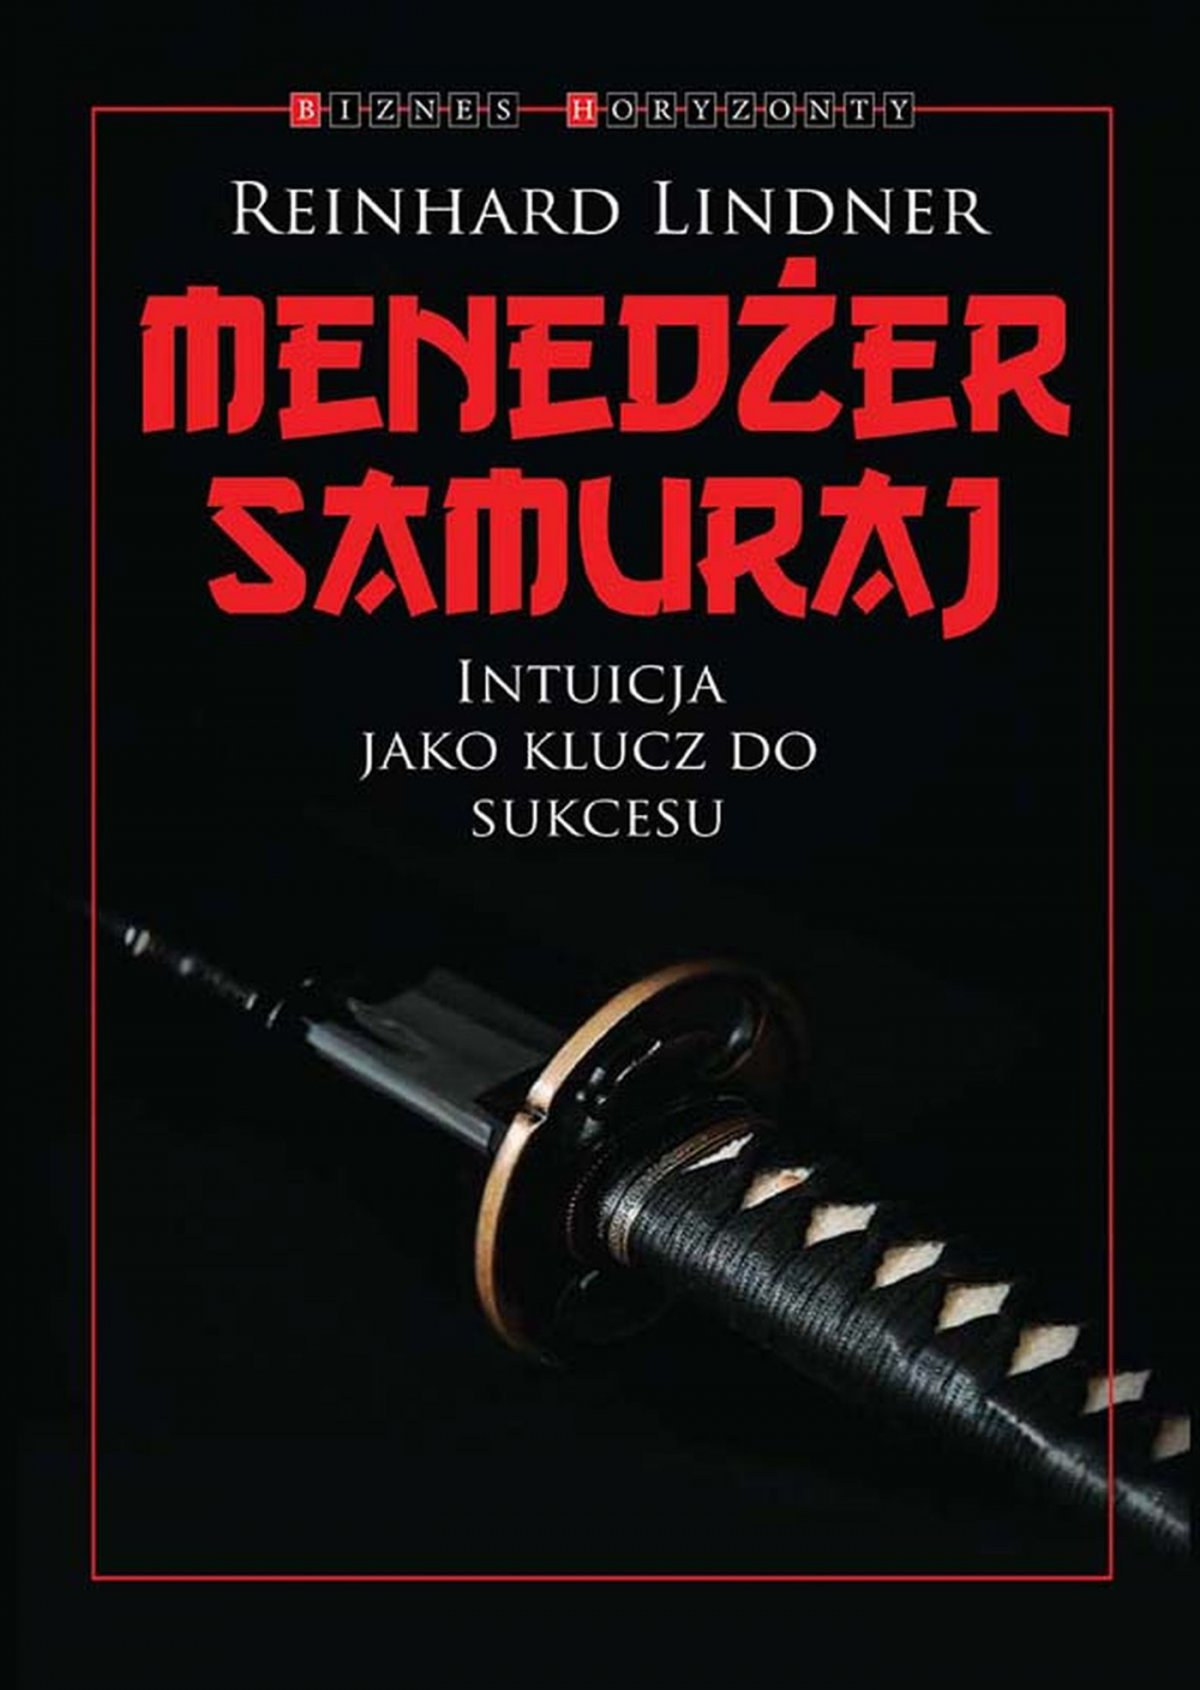 Menedżer Samuraj - Ebook (Książka na Kindle) do pobrania w formacie MOBI